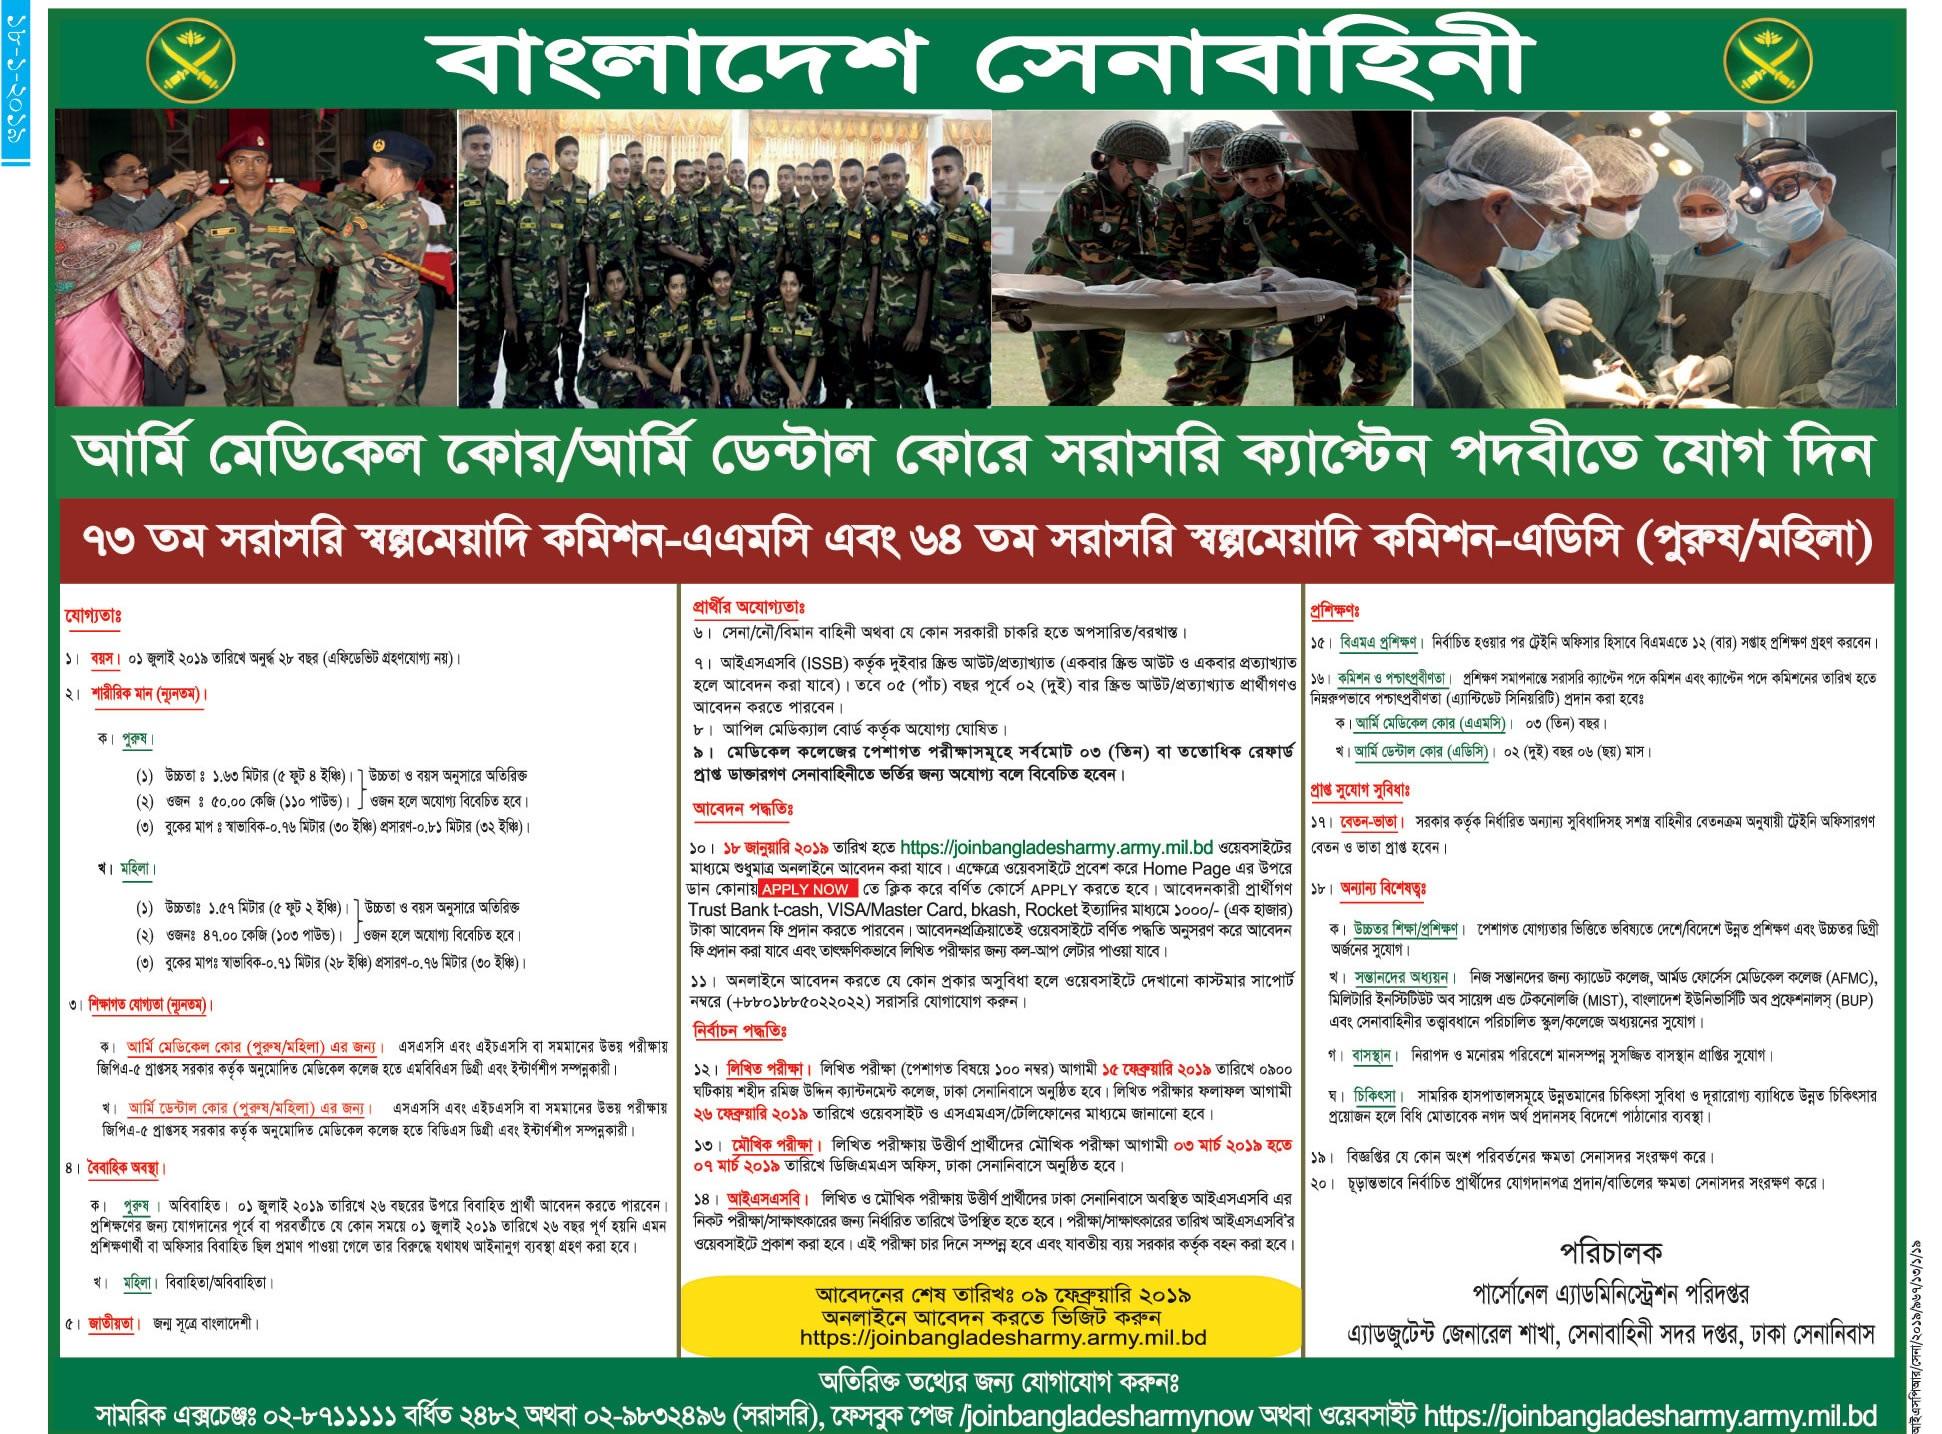 Bangladesh Army Civilian Job Circular 2019